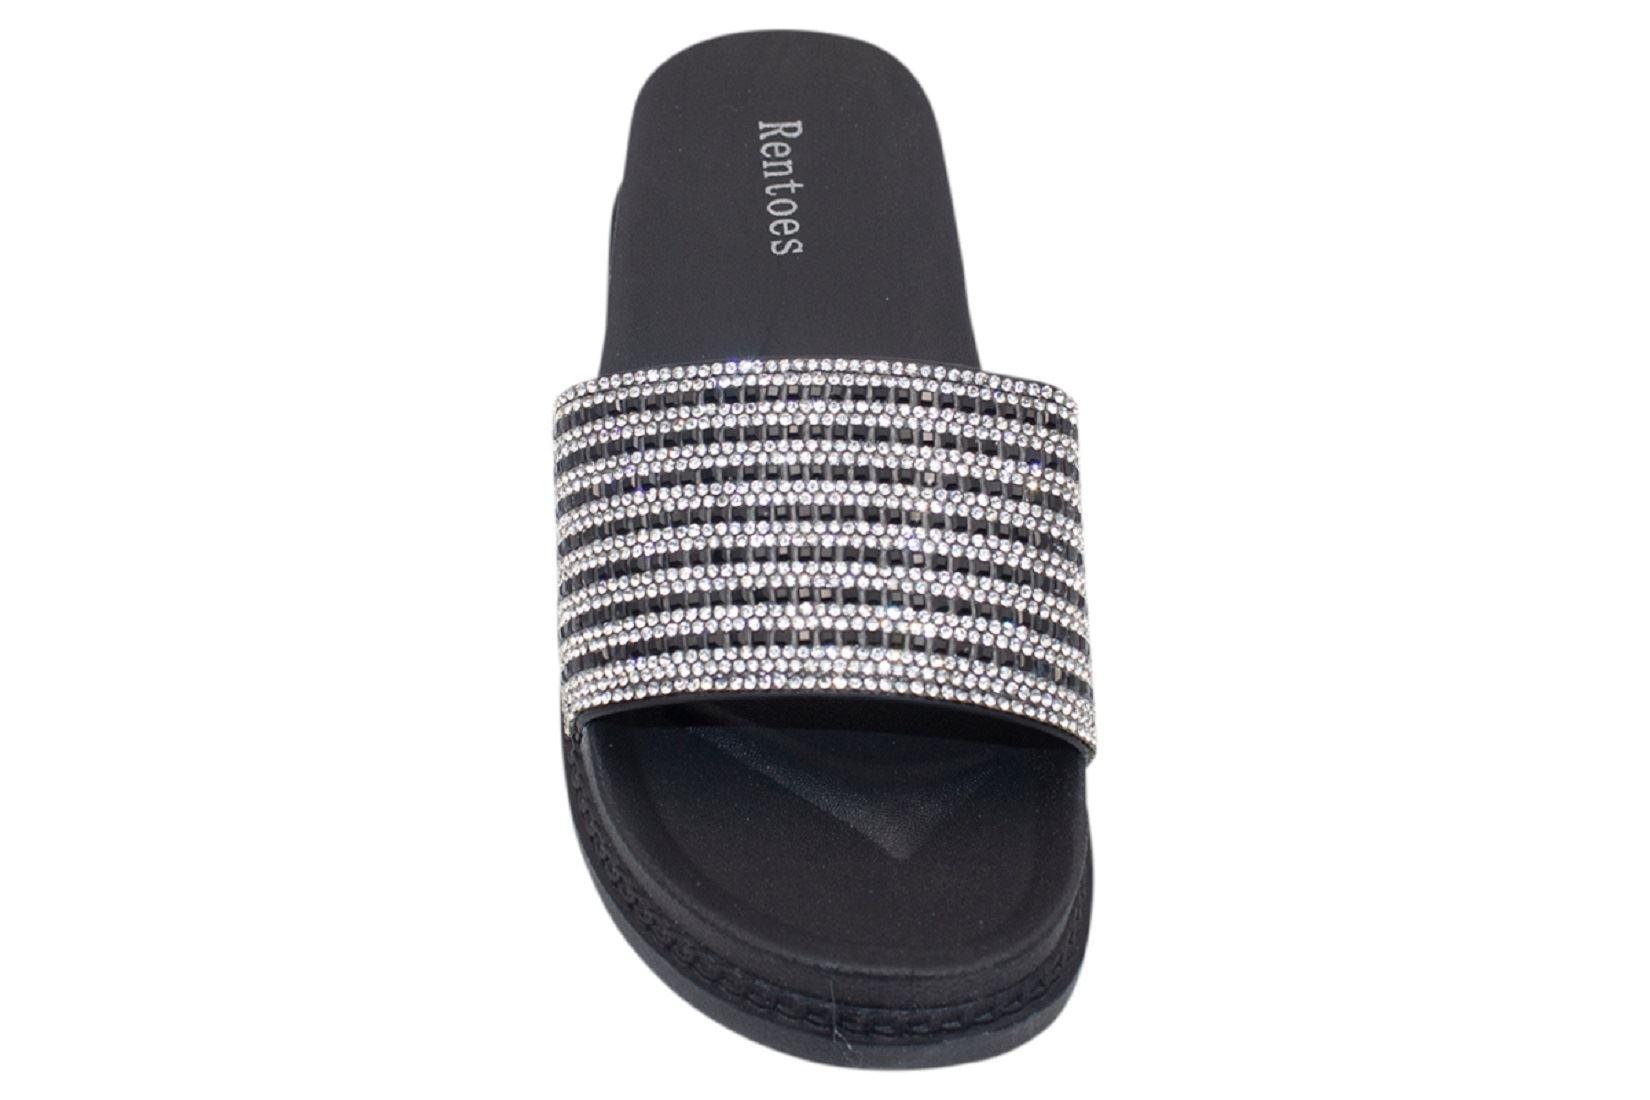 Womens-Sliders-Casual-Slippers-Mules-Ladies-Diamante-Flip-Flop-Sandals-Shoes thumbnail 88